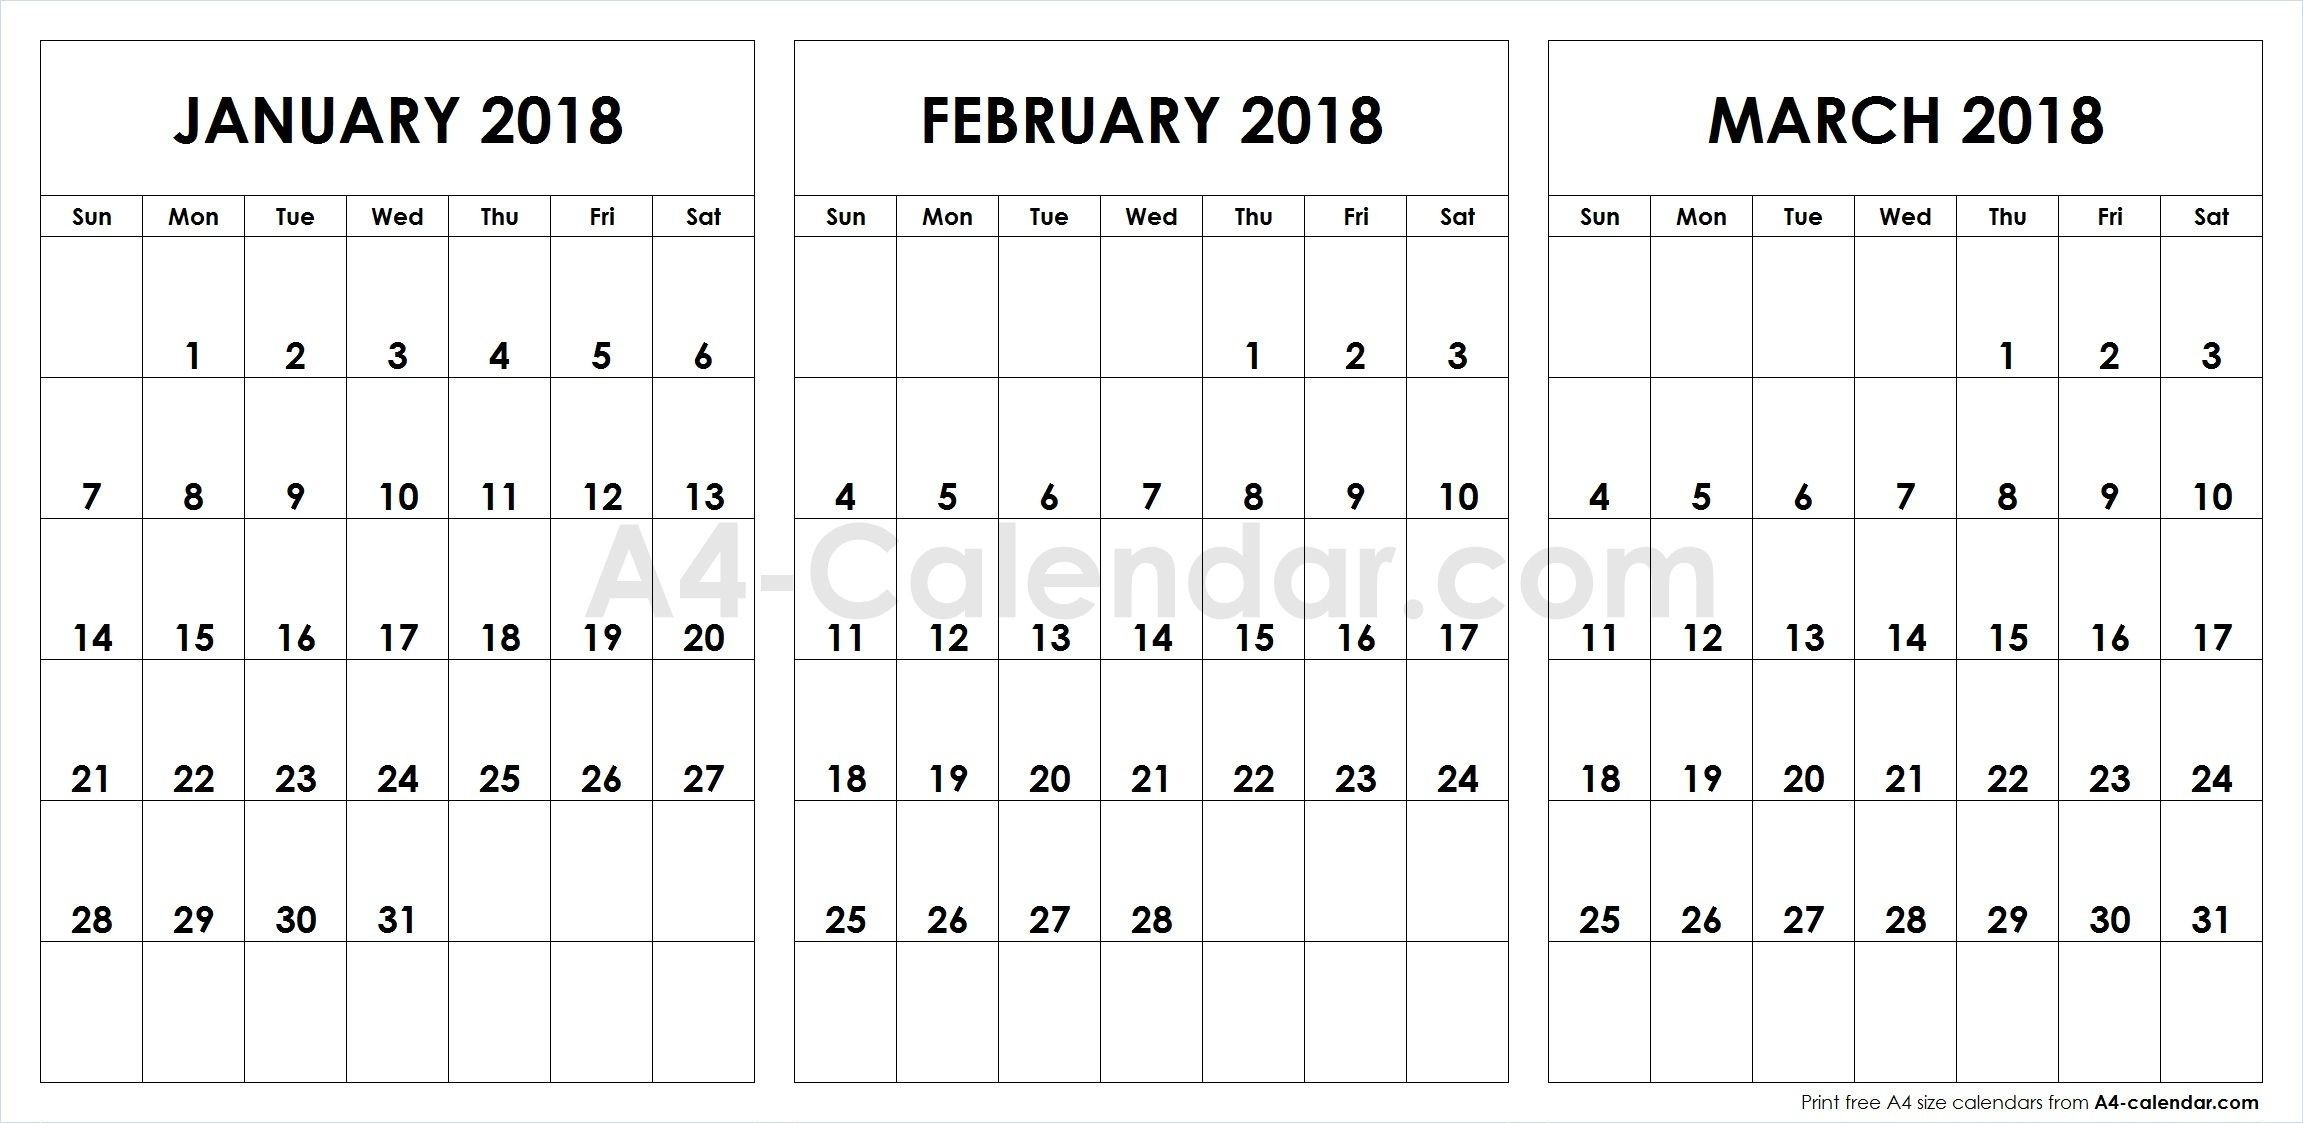 March Calendar Doodles Mejores Y Más Novedosos Prayer Calendar Template Lara Expolicenciaslatam Of March Calendar Doodles Más Caliente Free Printable 2017 Calendar Printables Pinterest